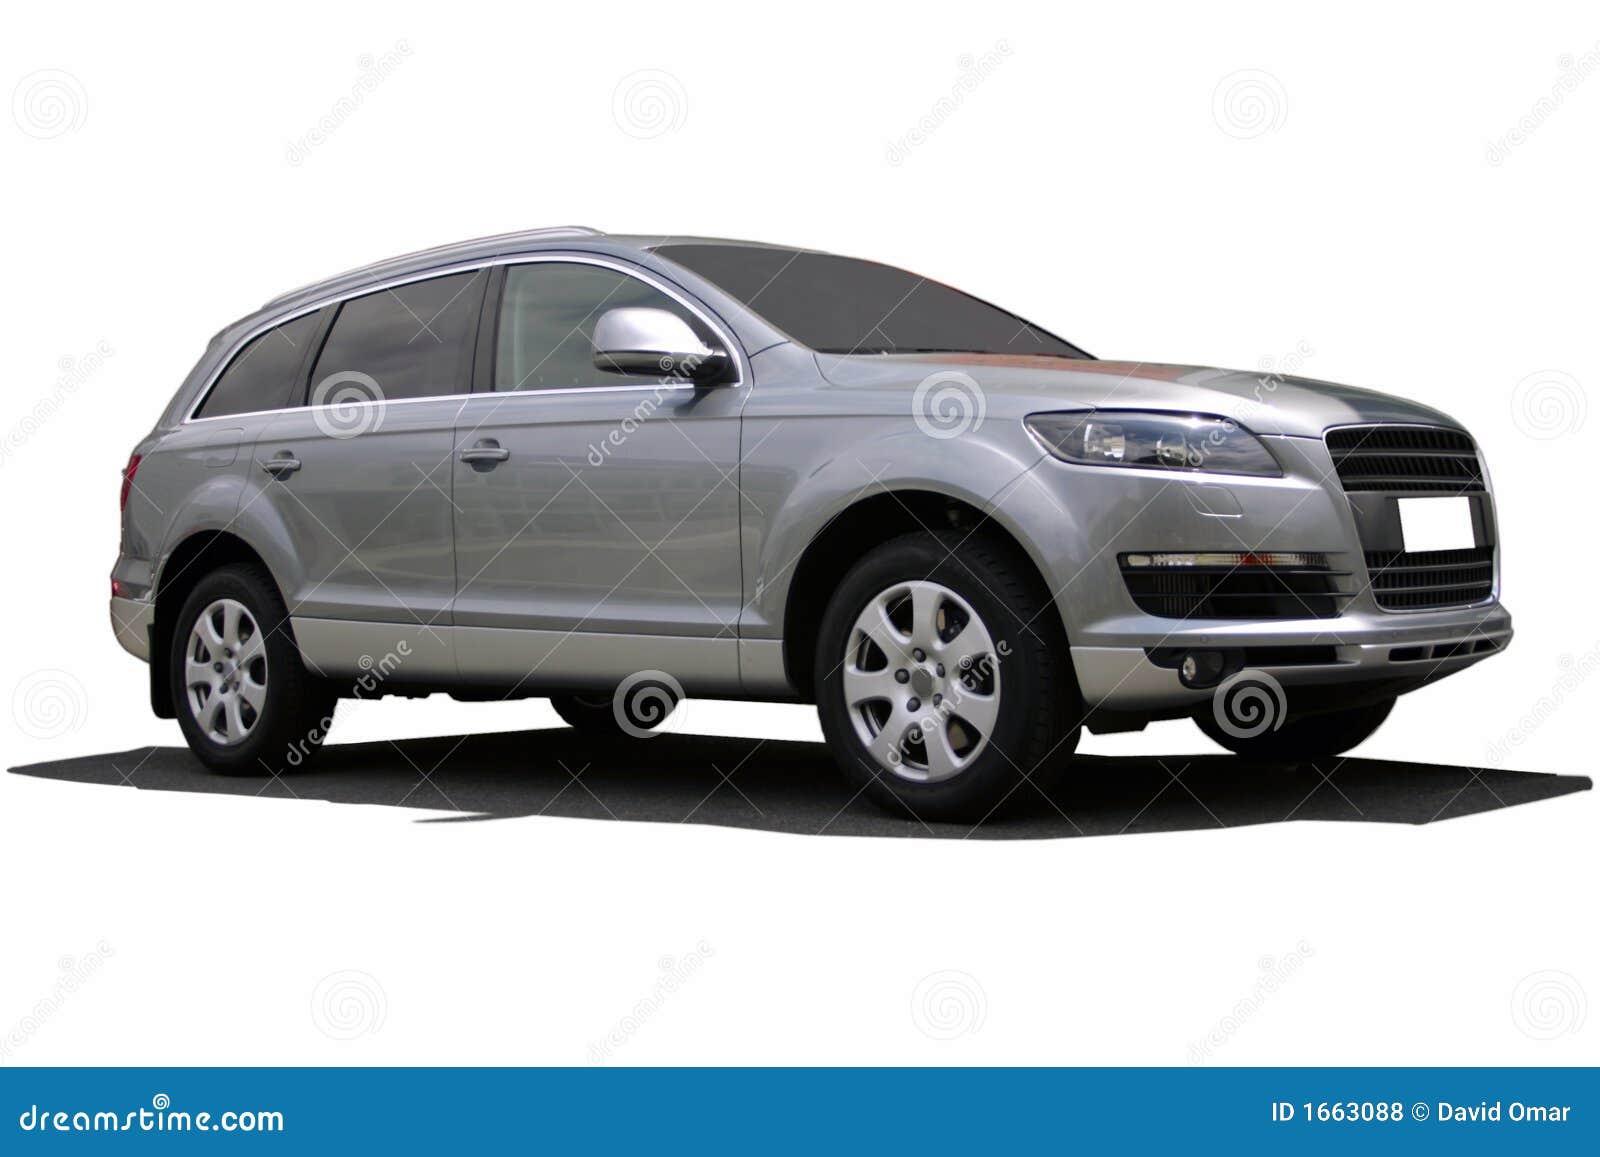 sports car suv stock photo image of tires vehicle speedster 1663088. Black Bedroom Furniture Sets. Home Design Ideas